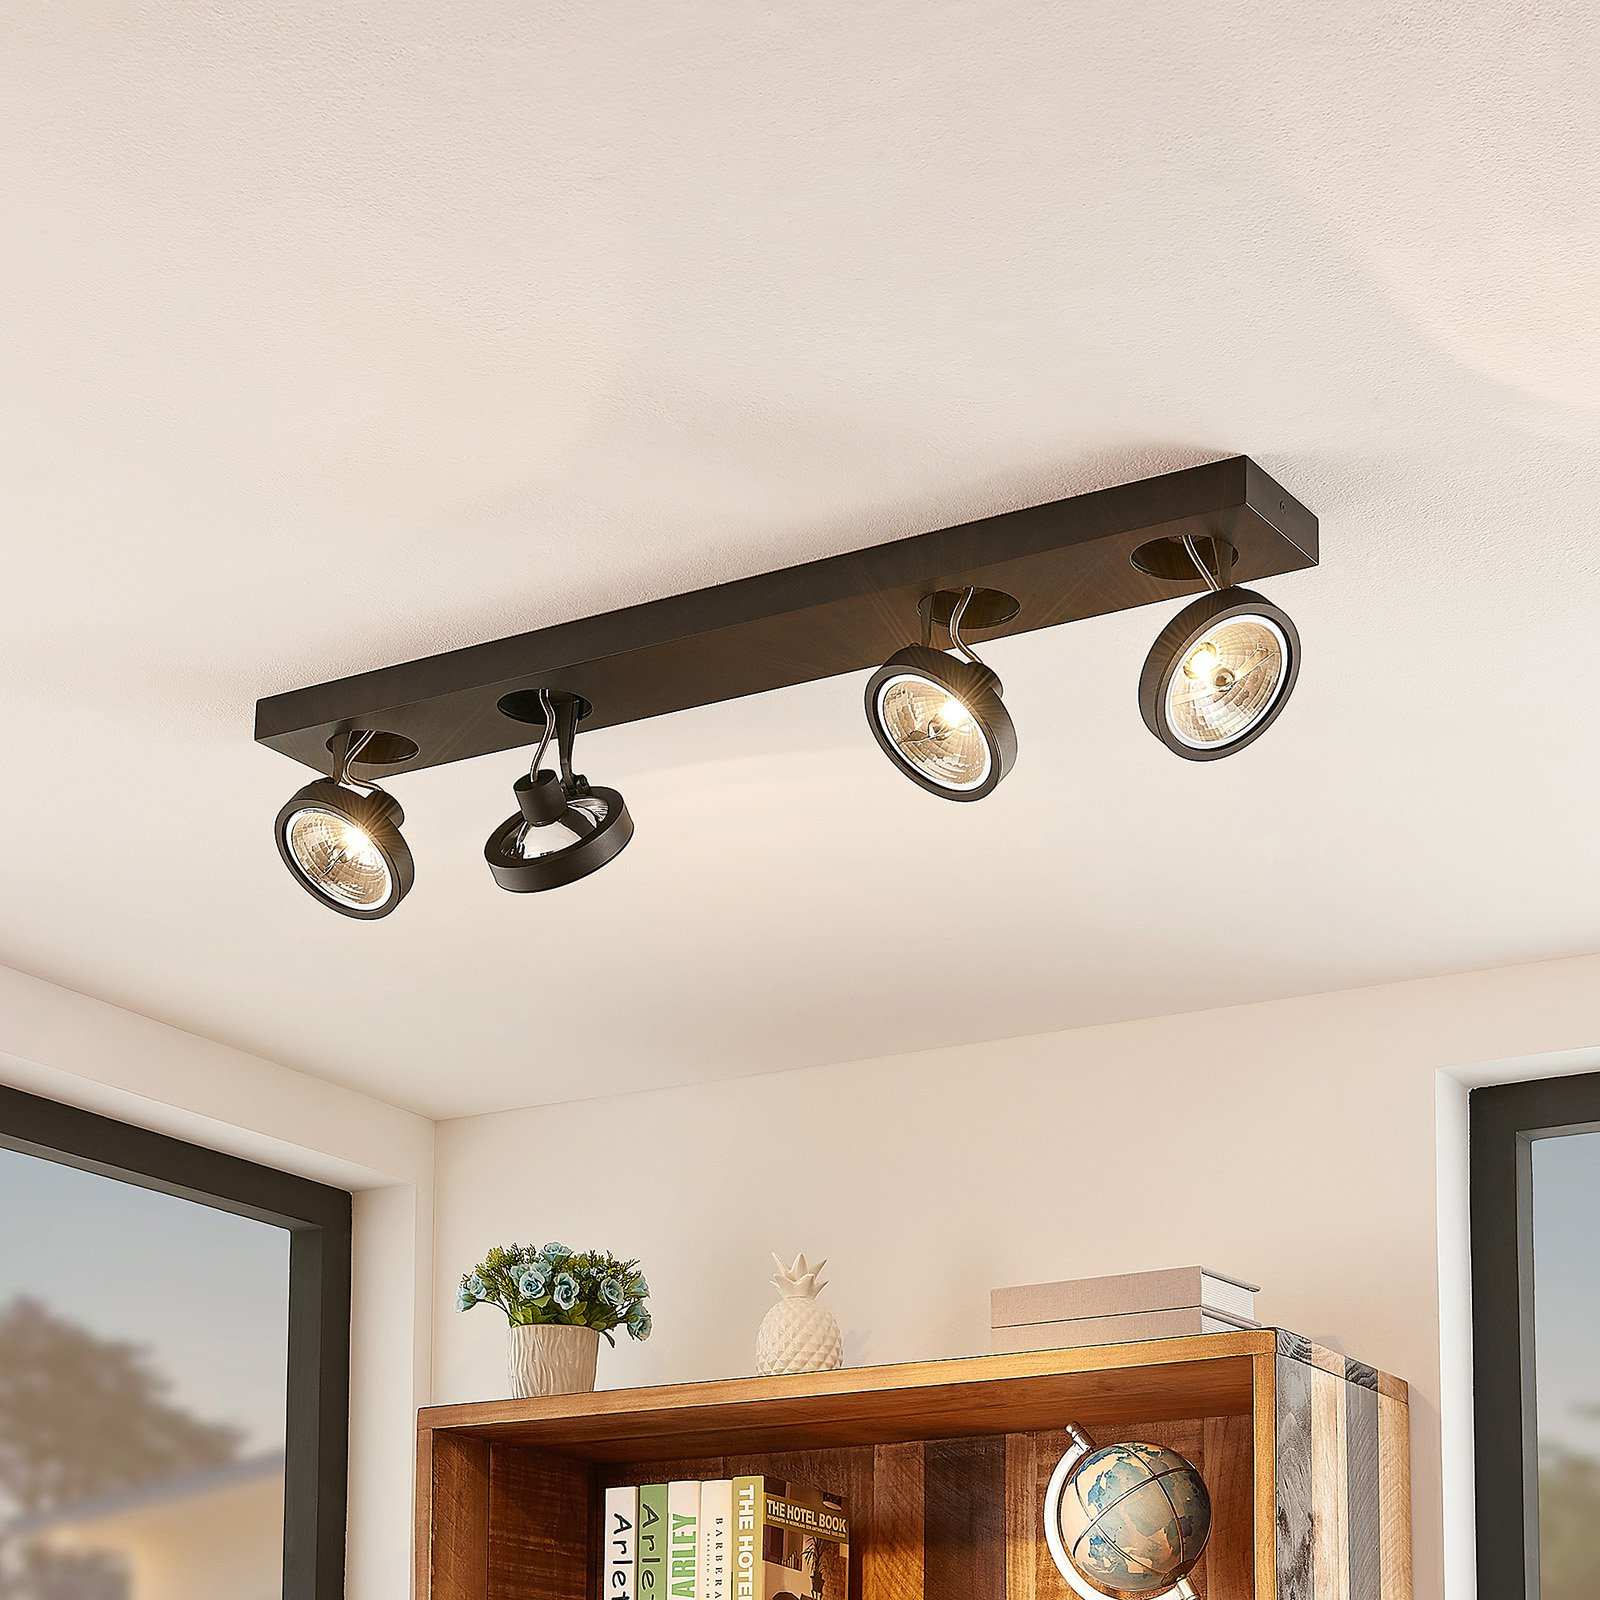 Arcchio Jorvin-taklampe, fire lyskilder, svart